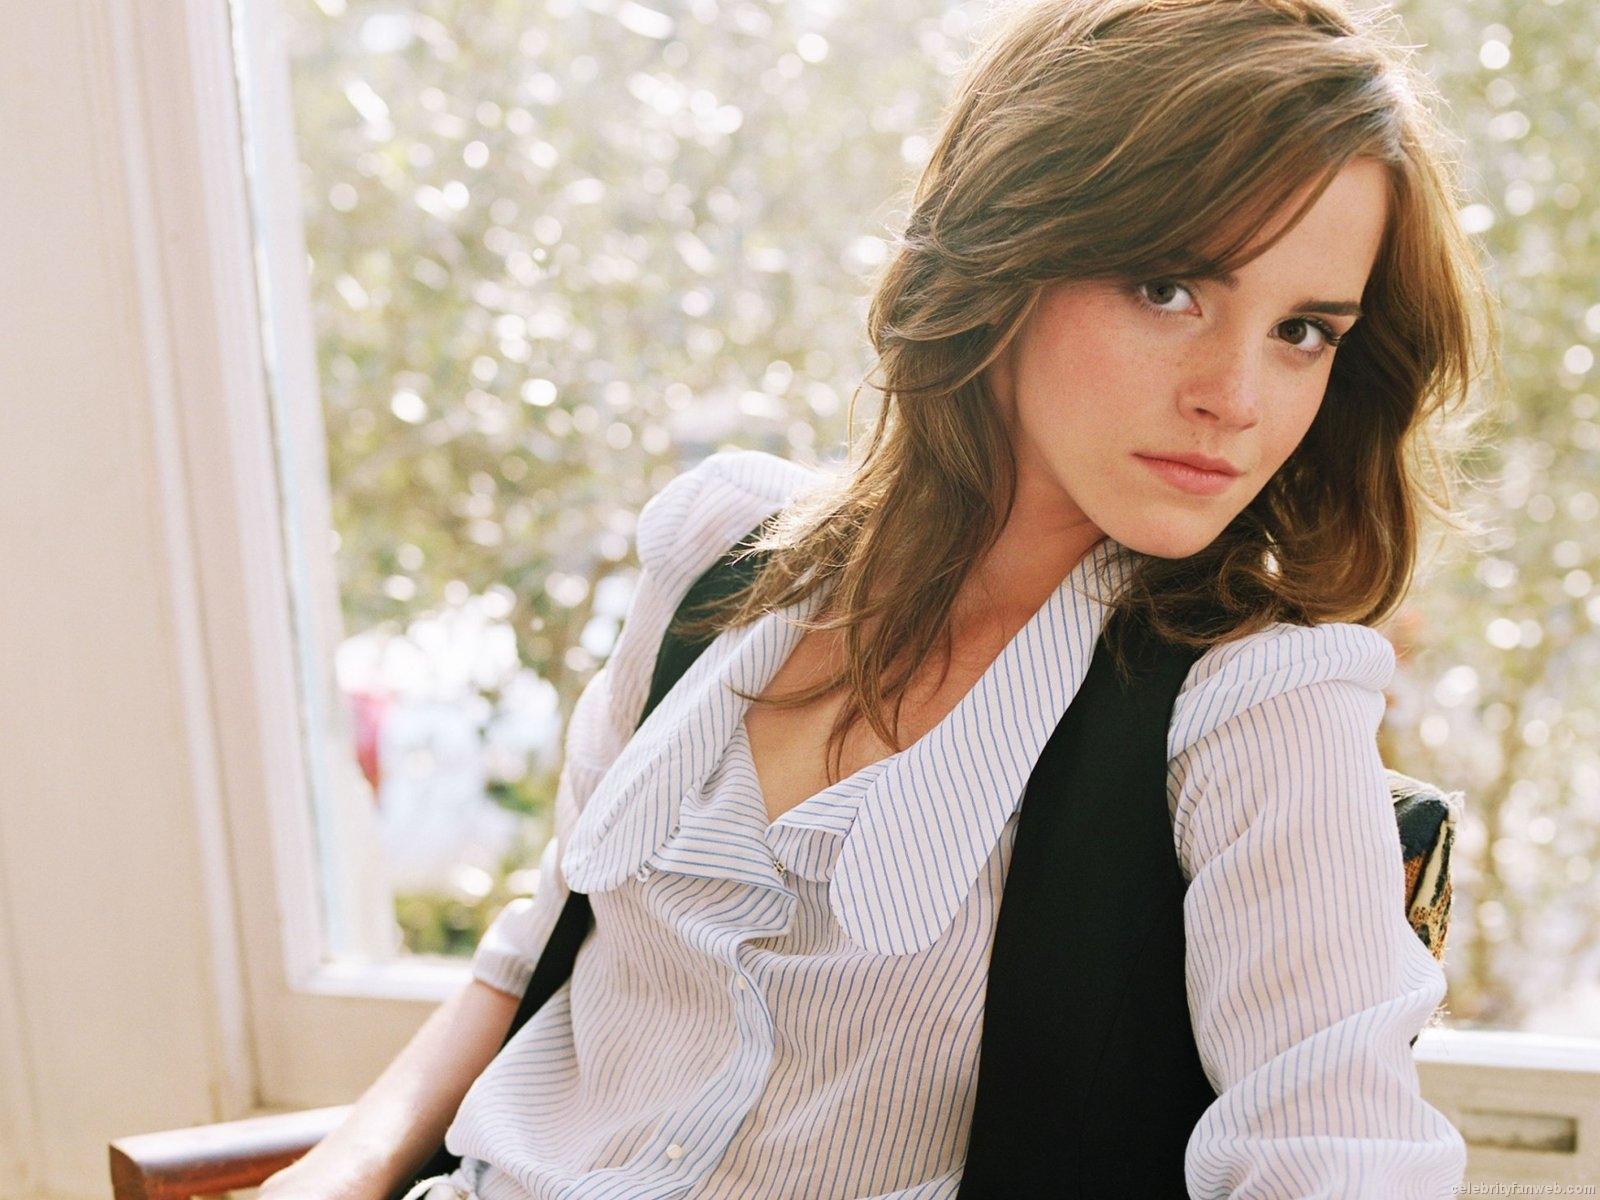 Emma Watson Wallpapers Emma Watson Cool HD 2012 Wallpapers 1600x1200